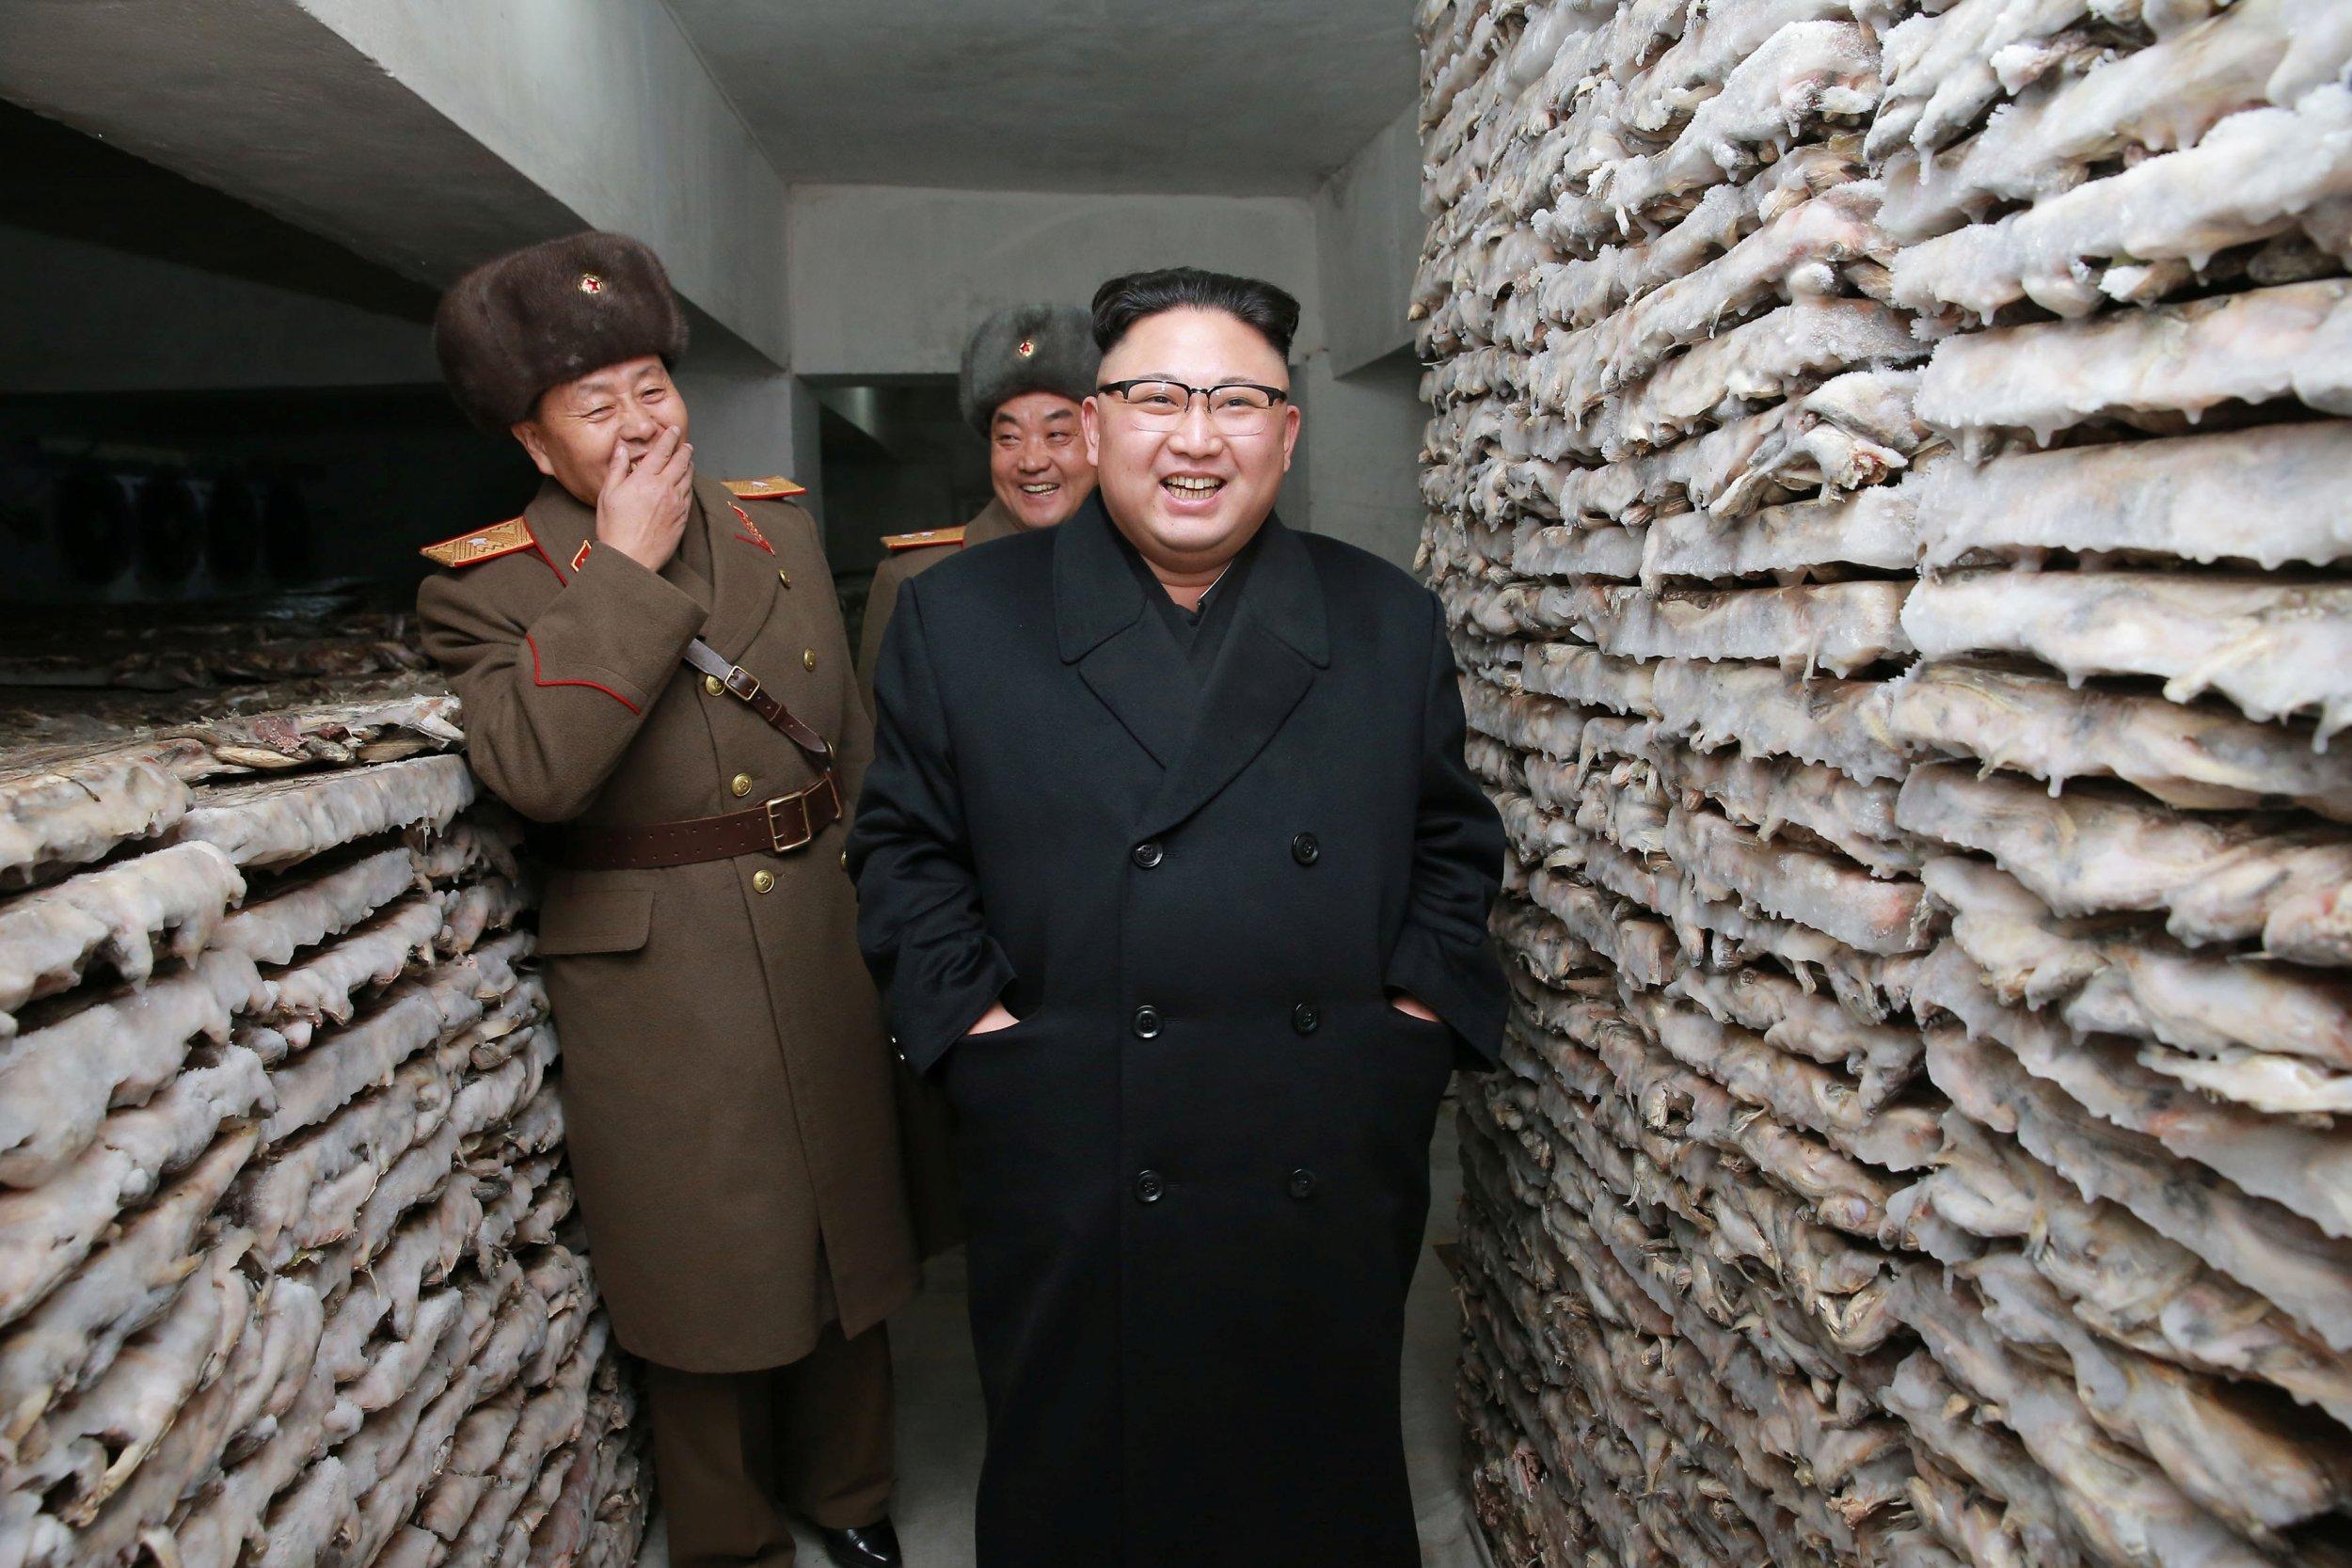 Kim Jong Un inspects army